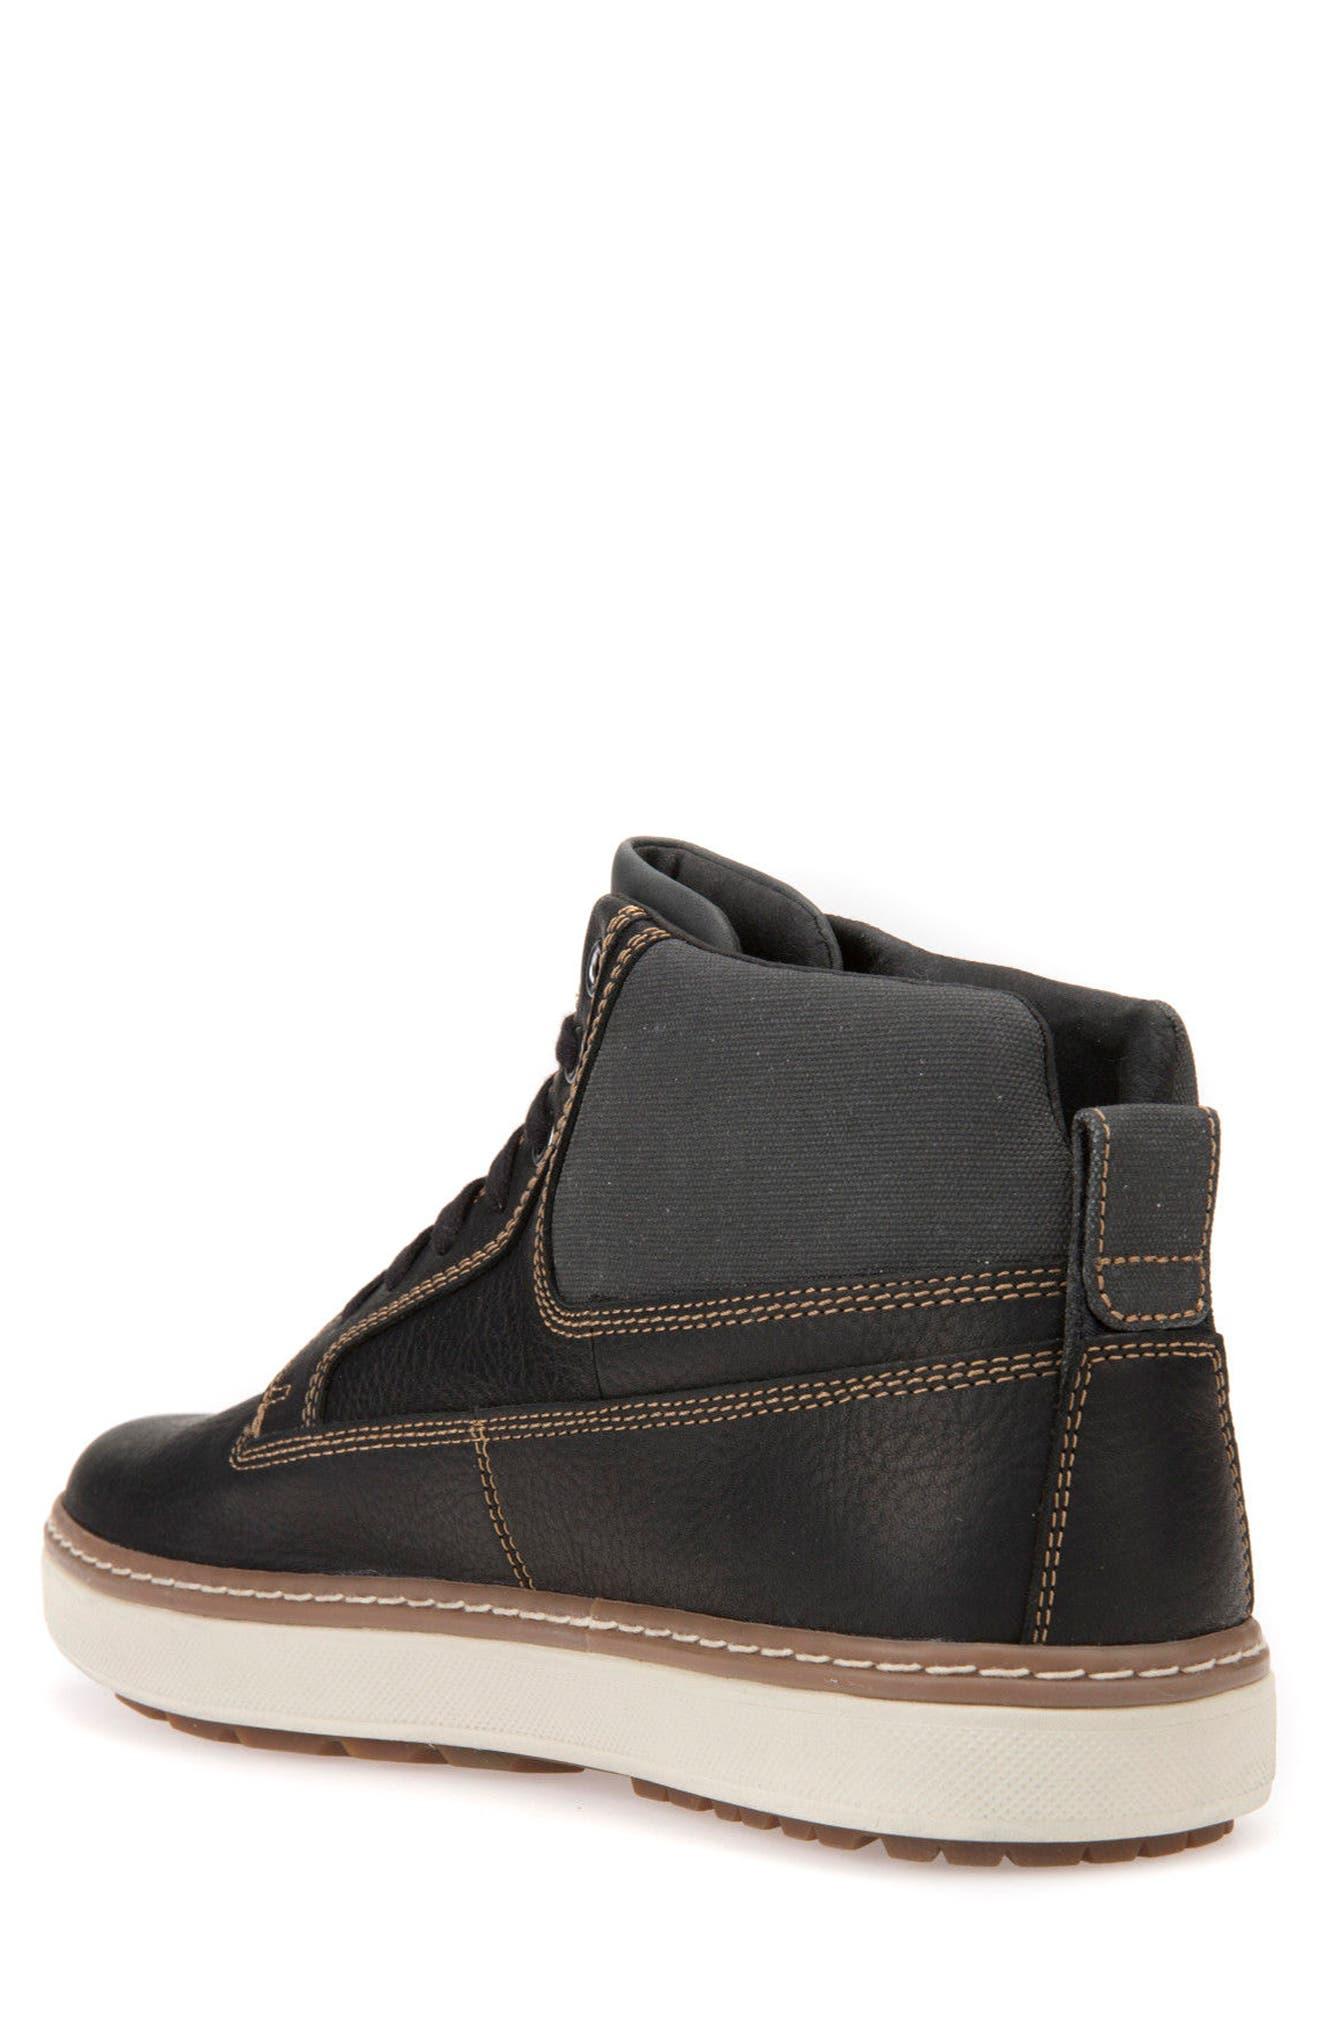 Mattias B ABX Waterproof Sneaker Boot,                             Alternate thumbnail 2, color,